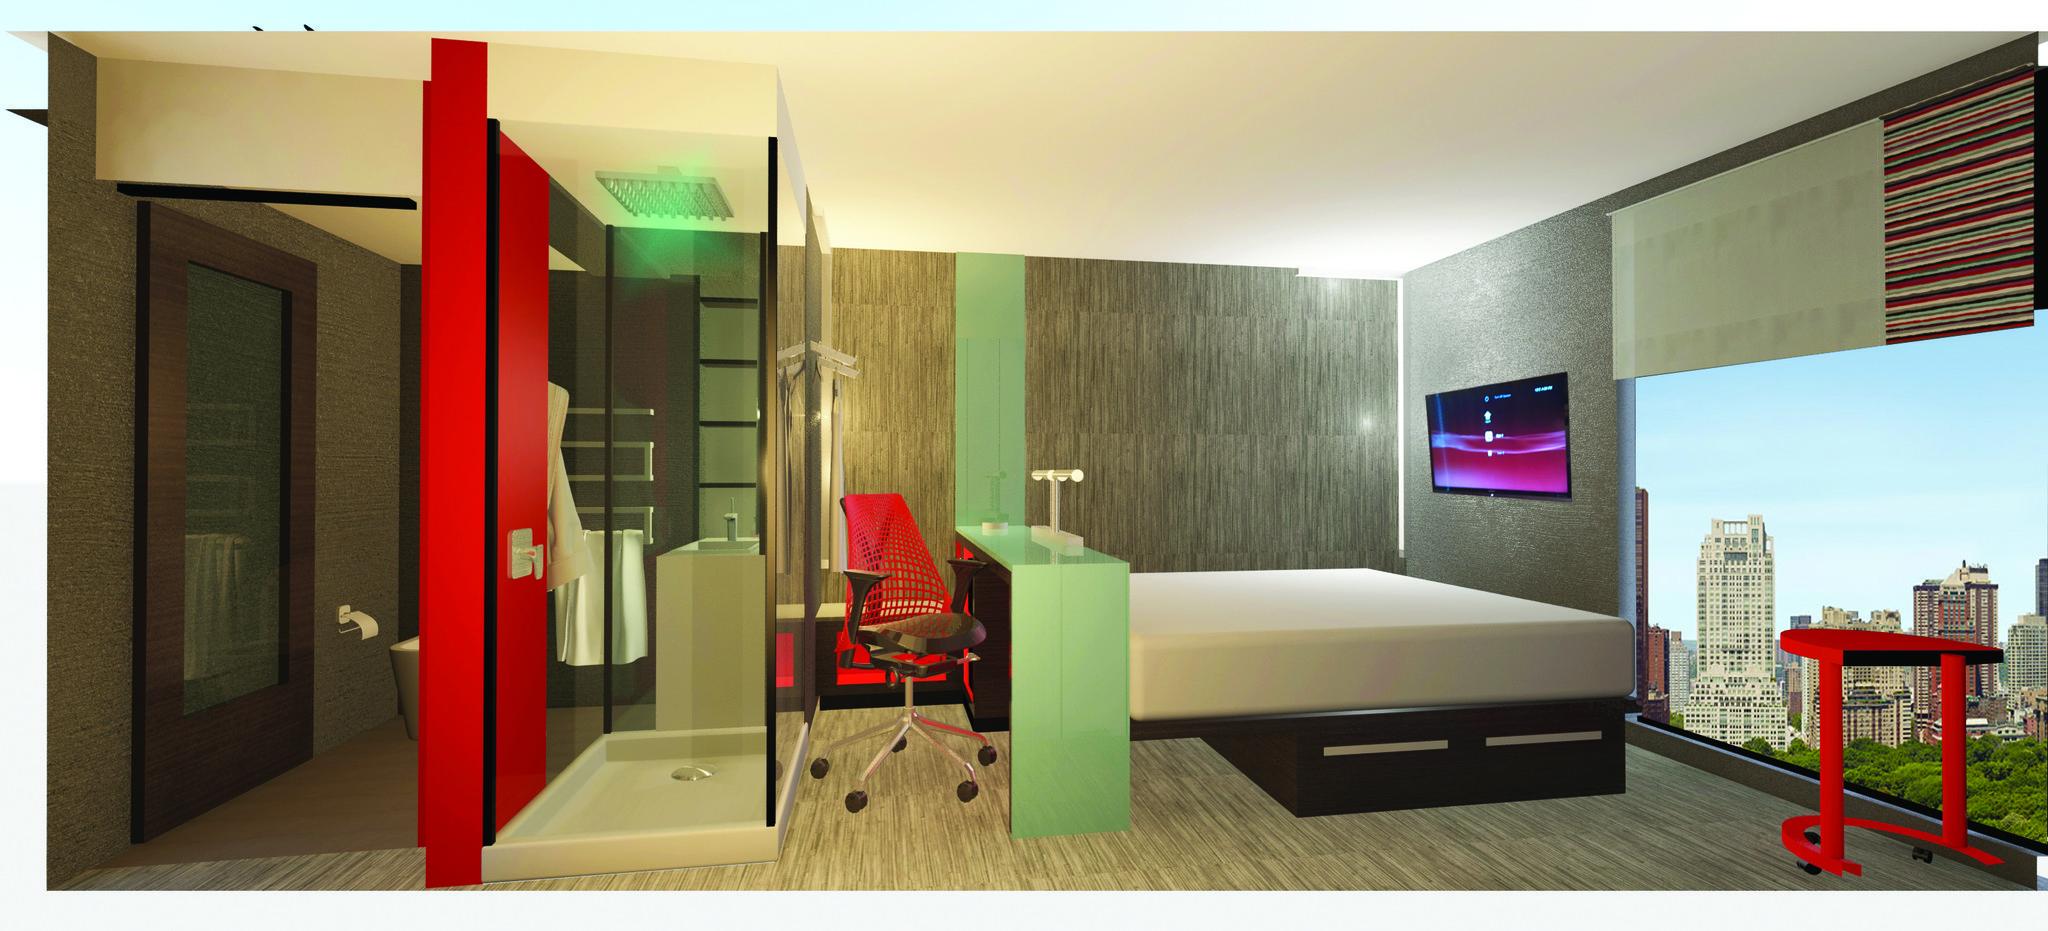 La Hotel Room Tax